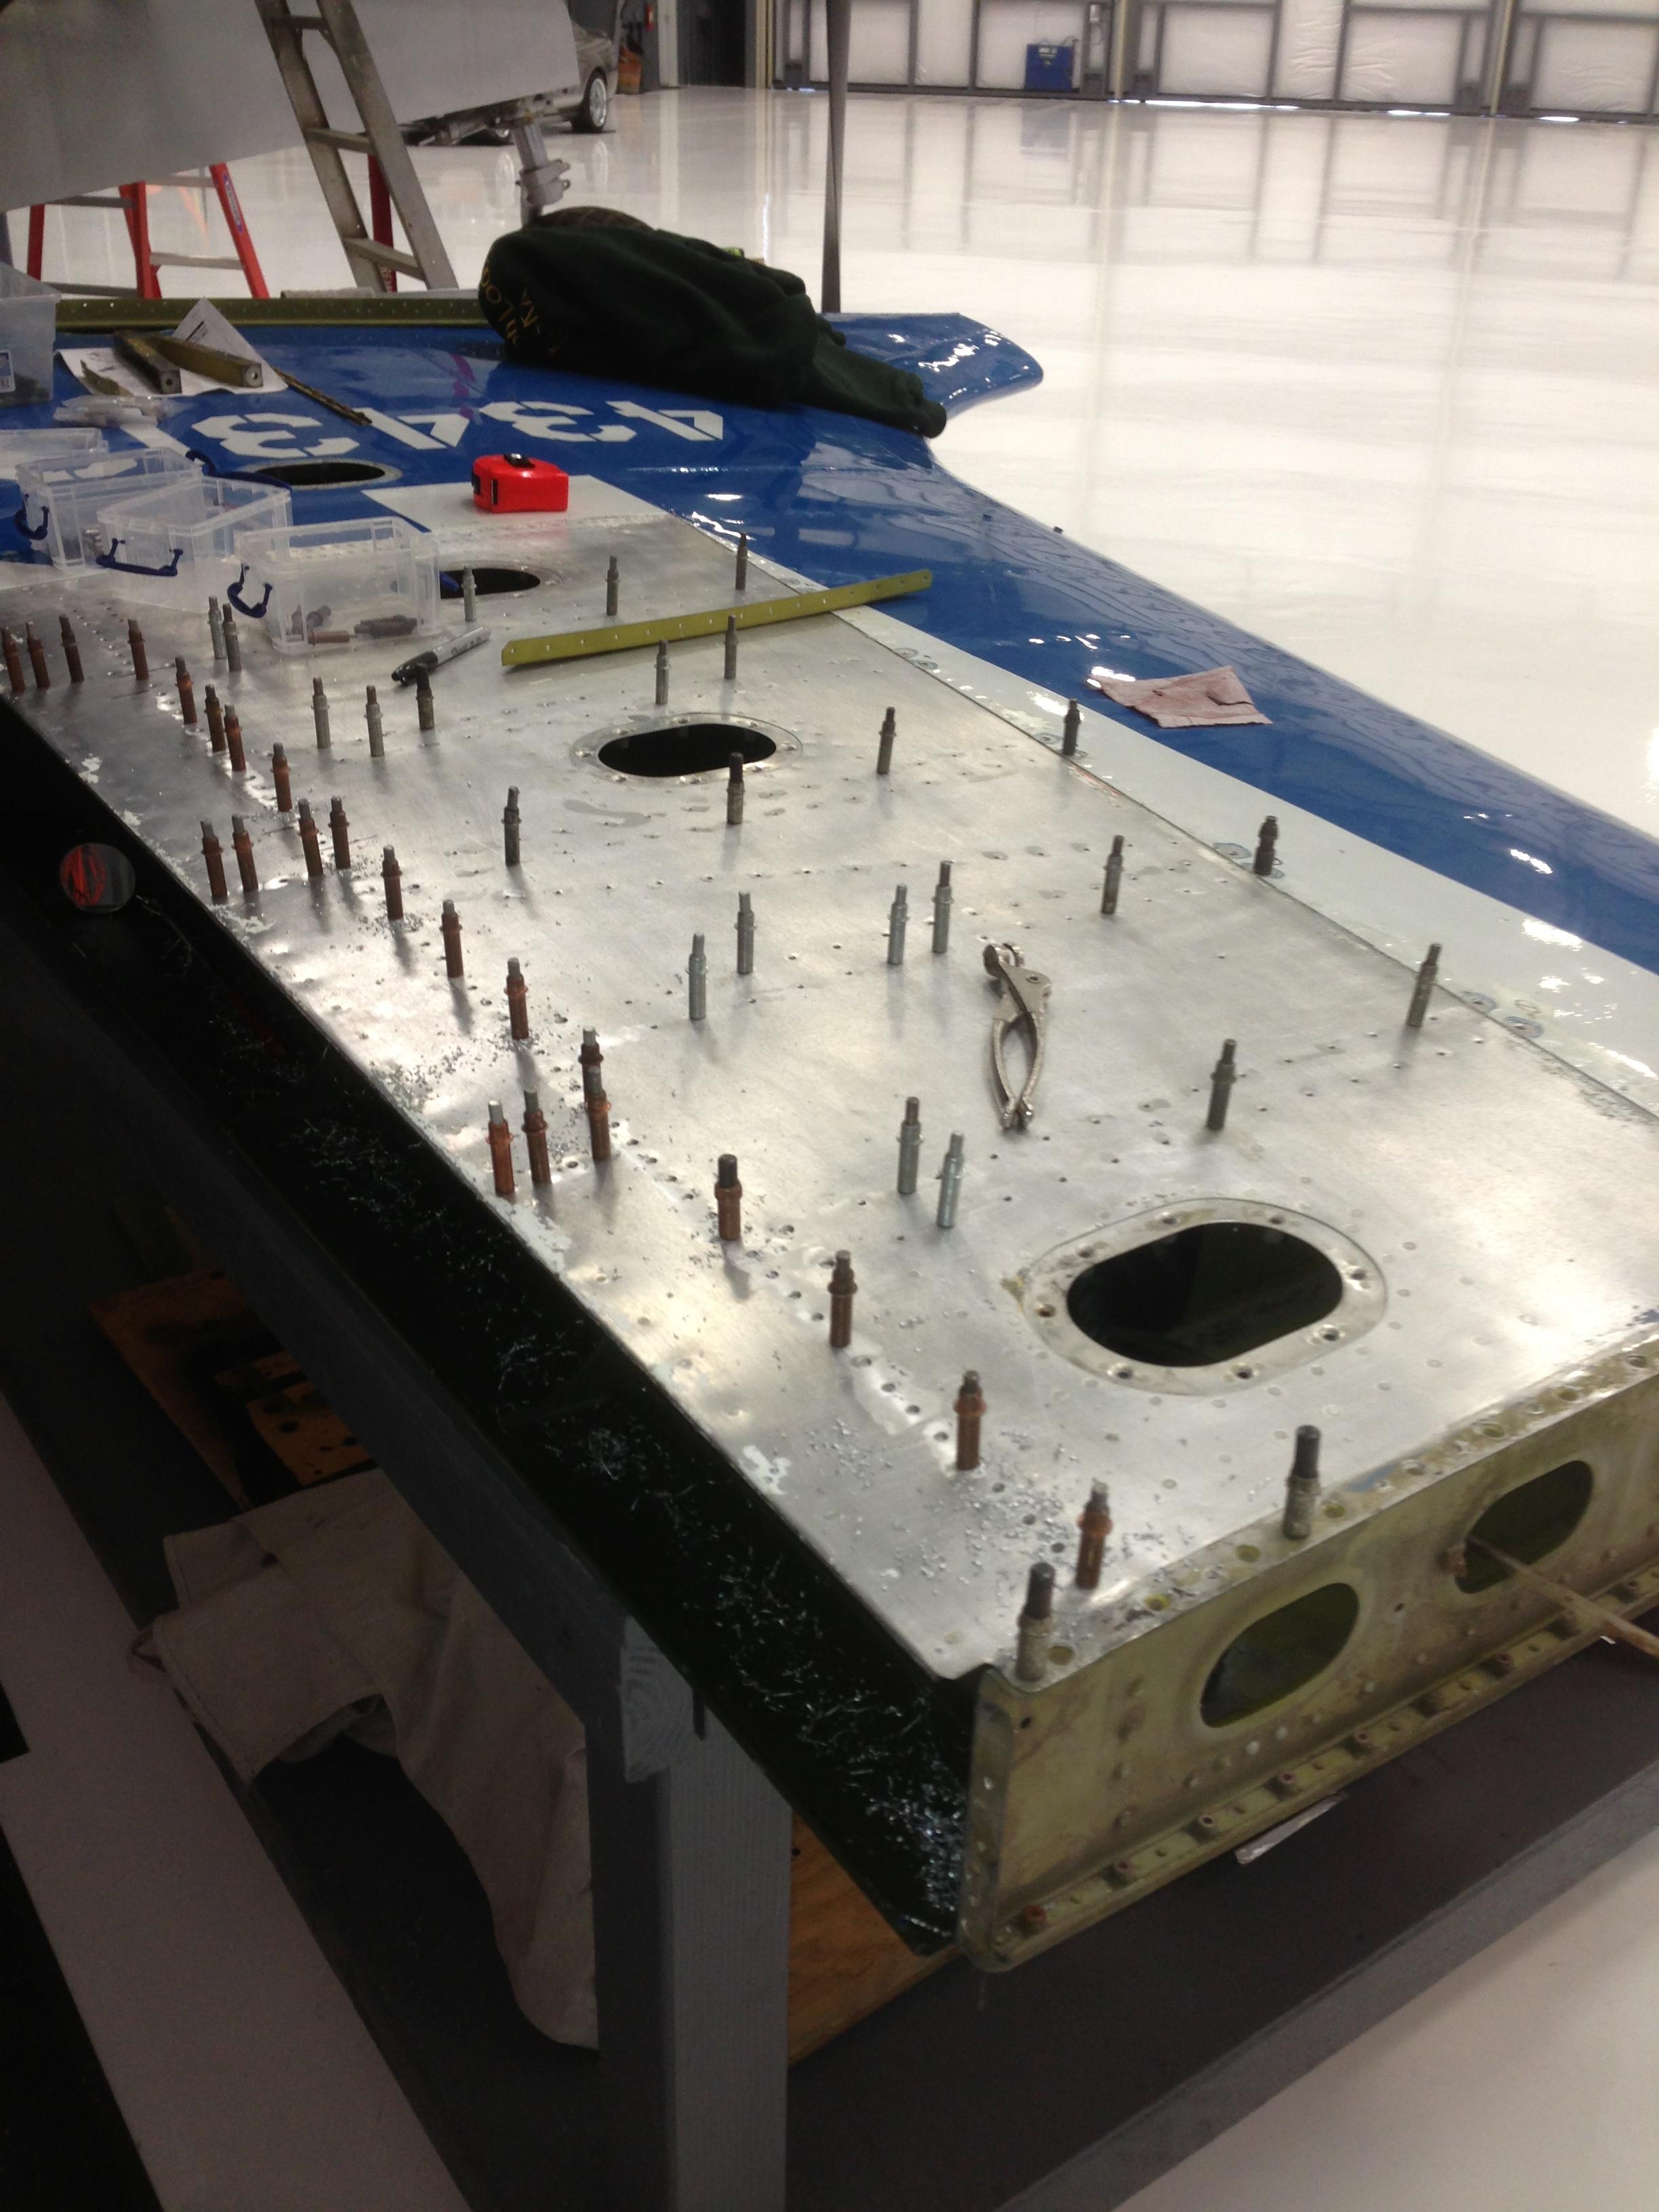 Vertical stabilizer repair